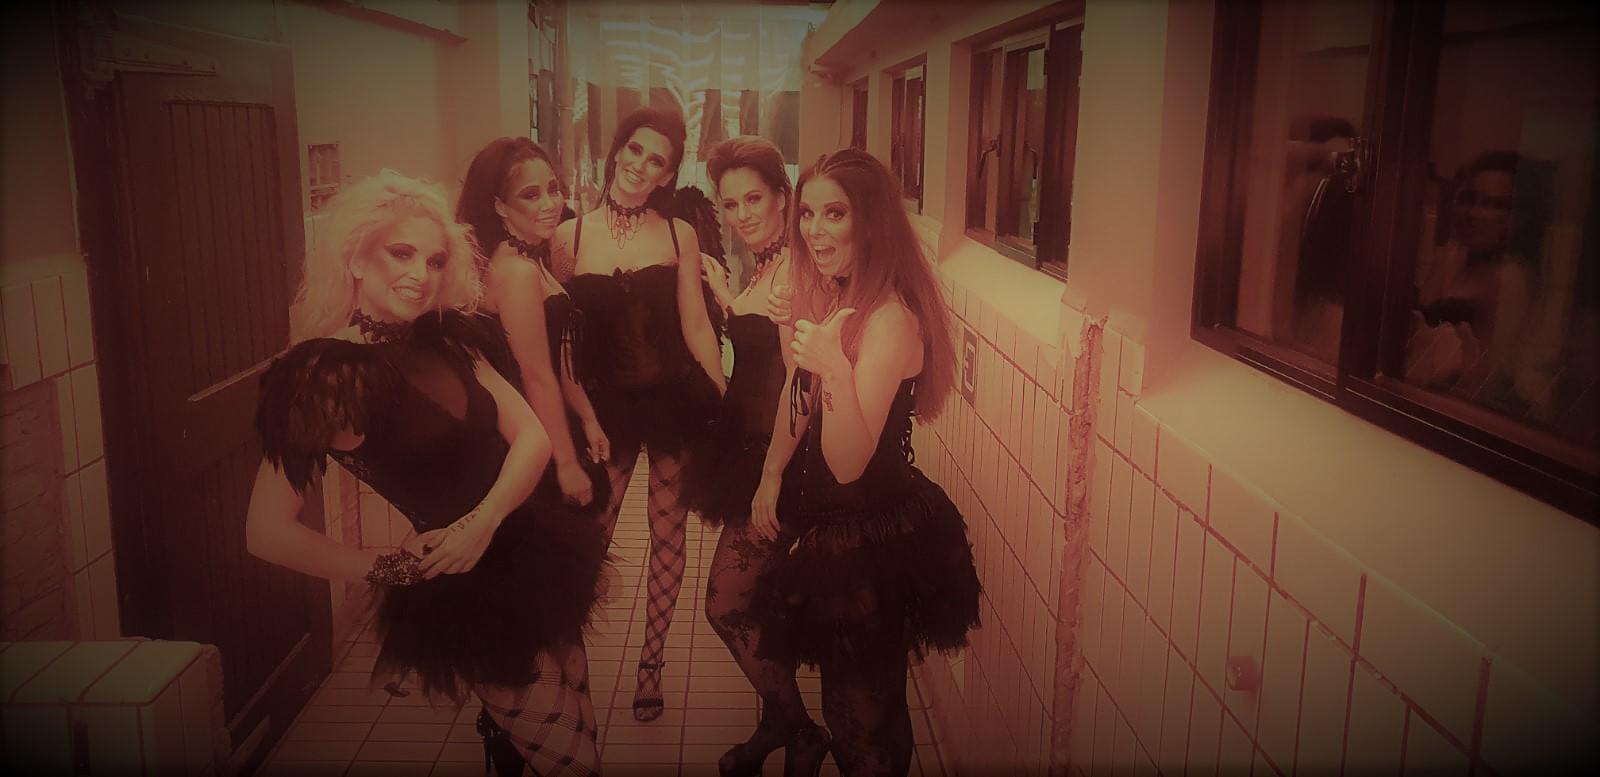 Black smoke Antwerpen PION horeca & Promotie i.s.m. Beauty Meets Business